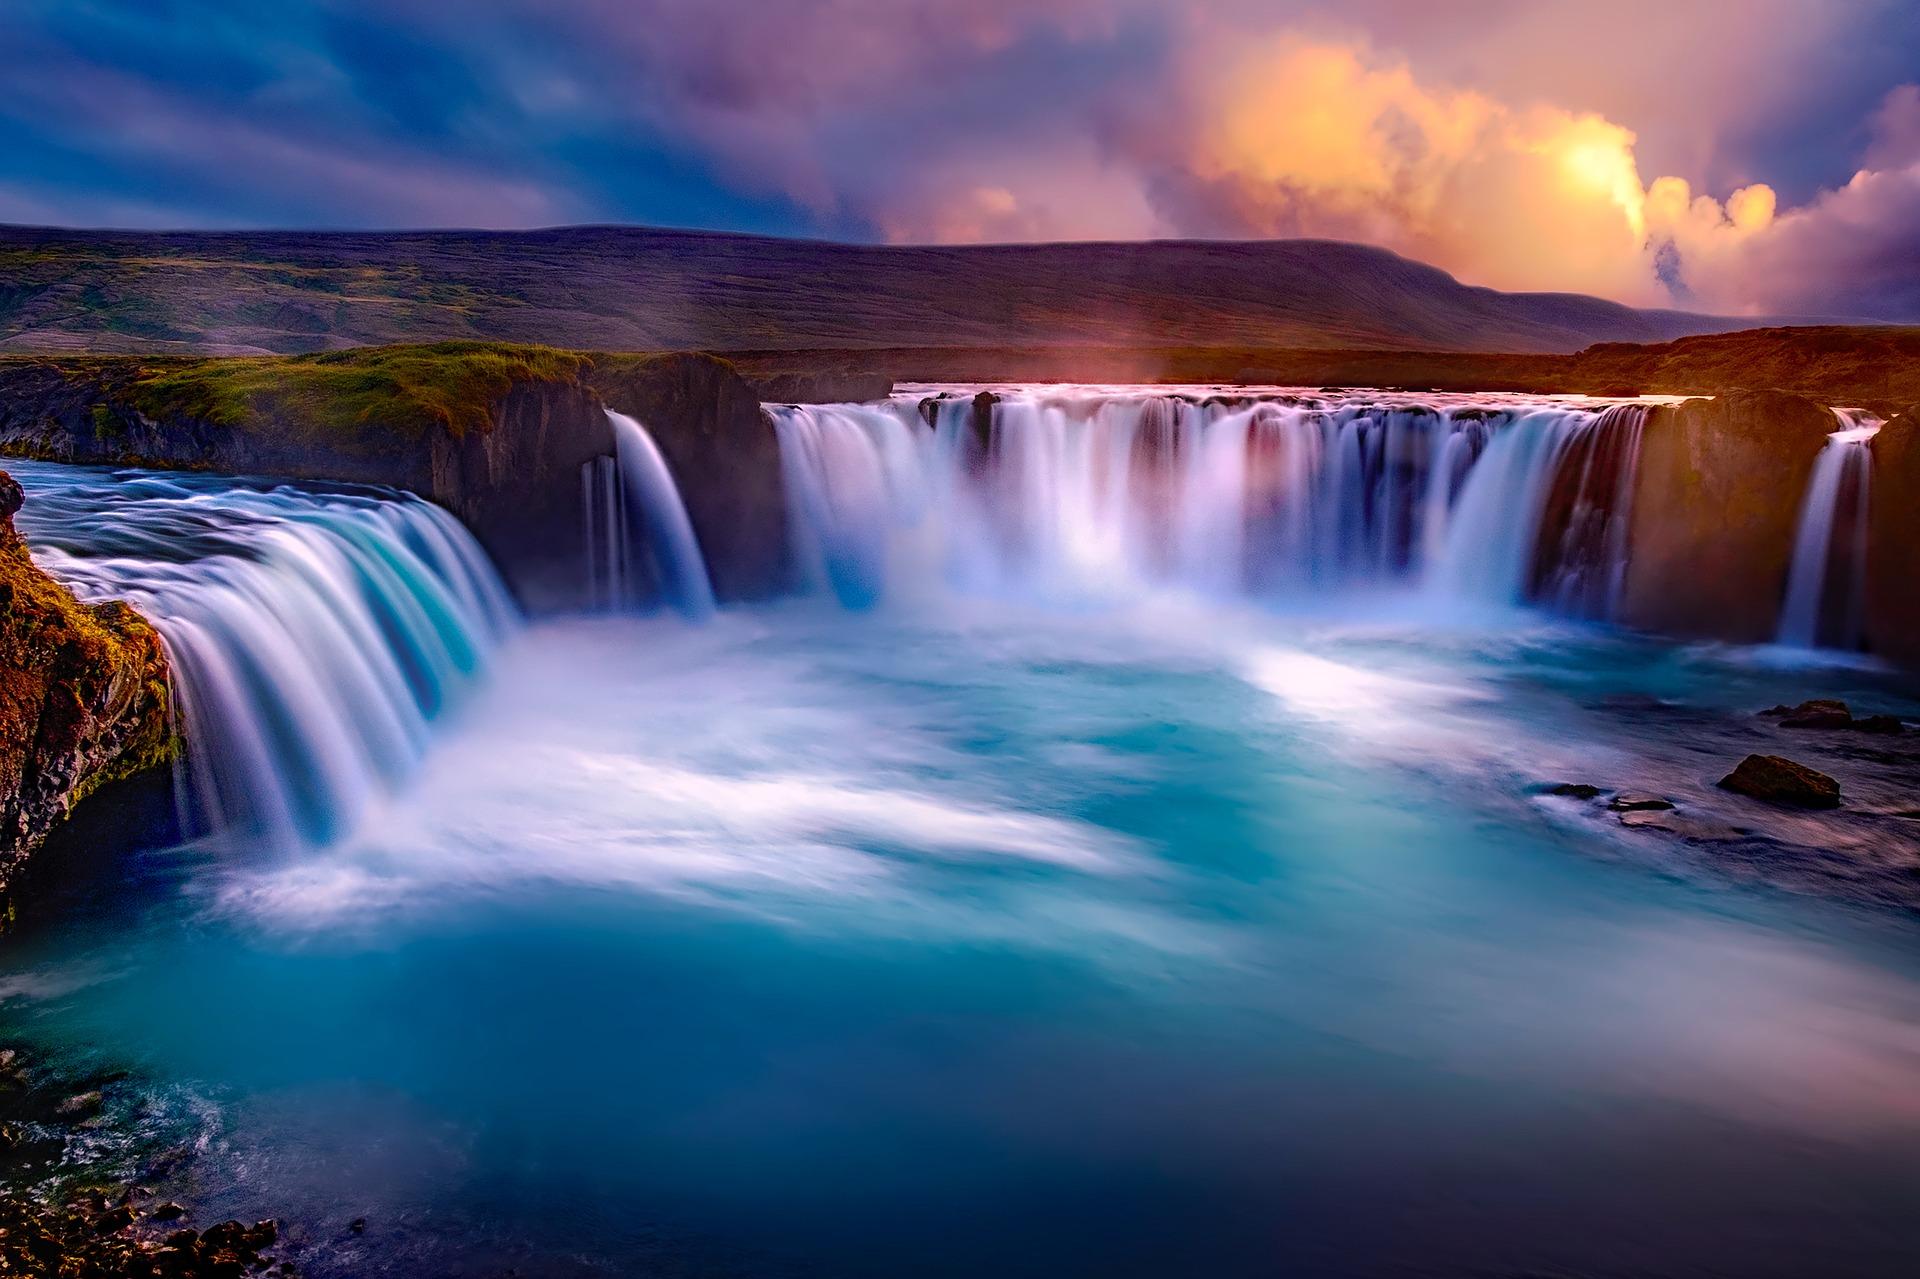 Gran tour por Islandia con excursión de avistamiento de ballenas (10 días)